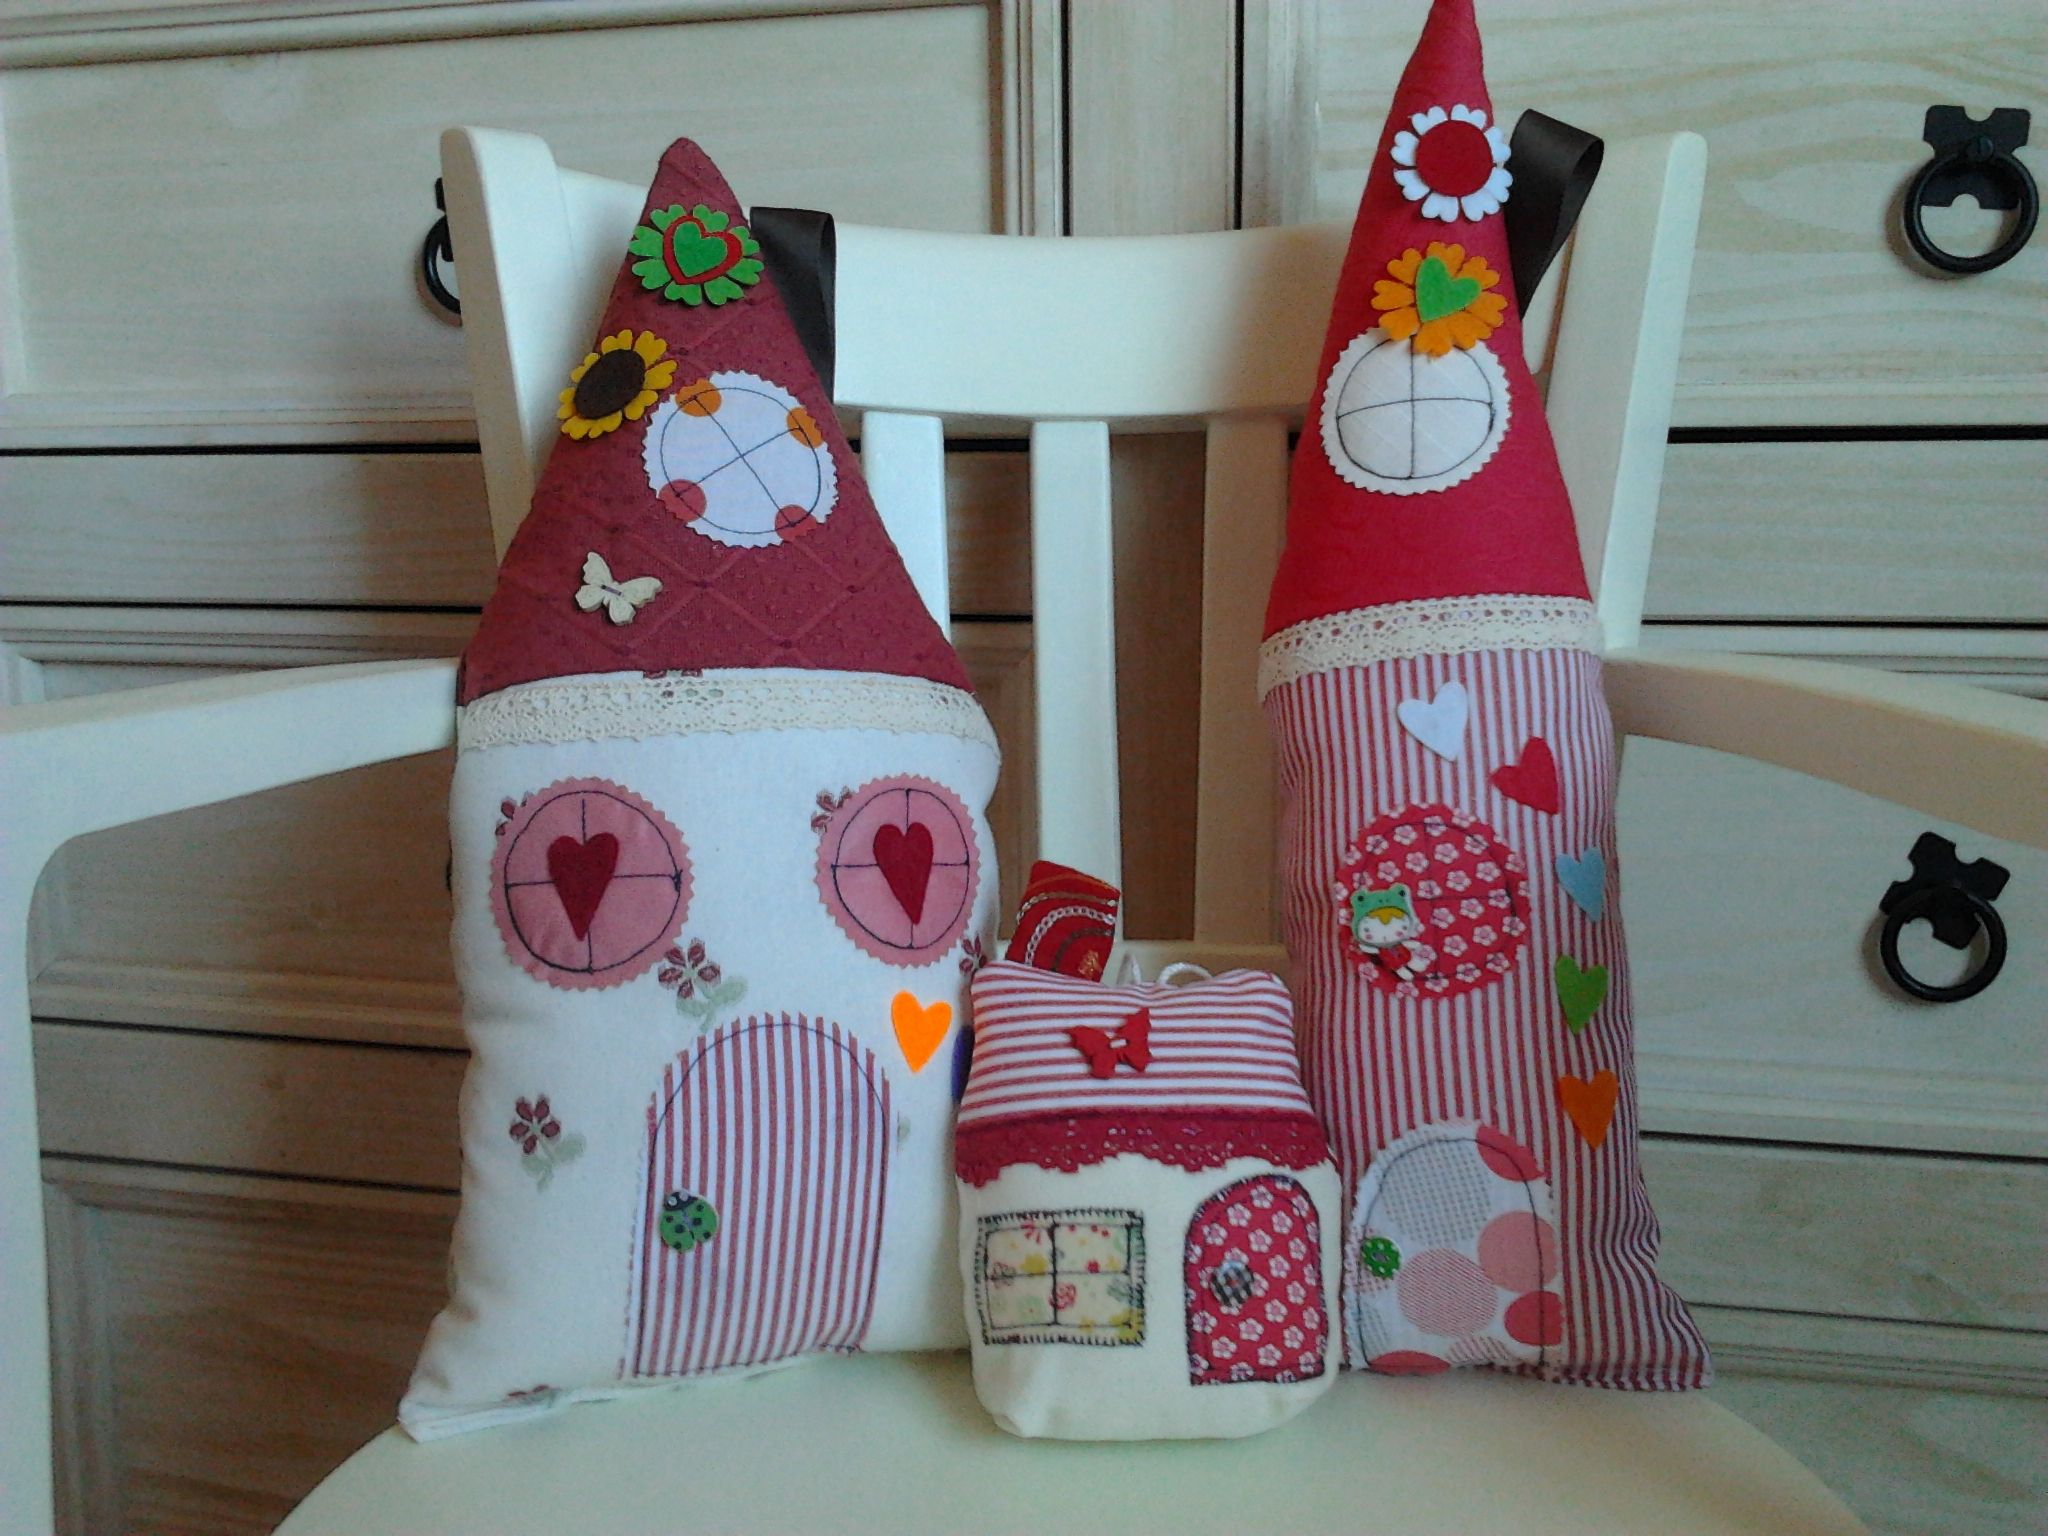 Casitas de tela para el hogar pinterest patchwork - Manualidades de tela para el hogar ...